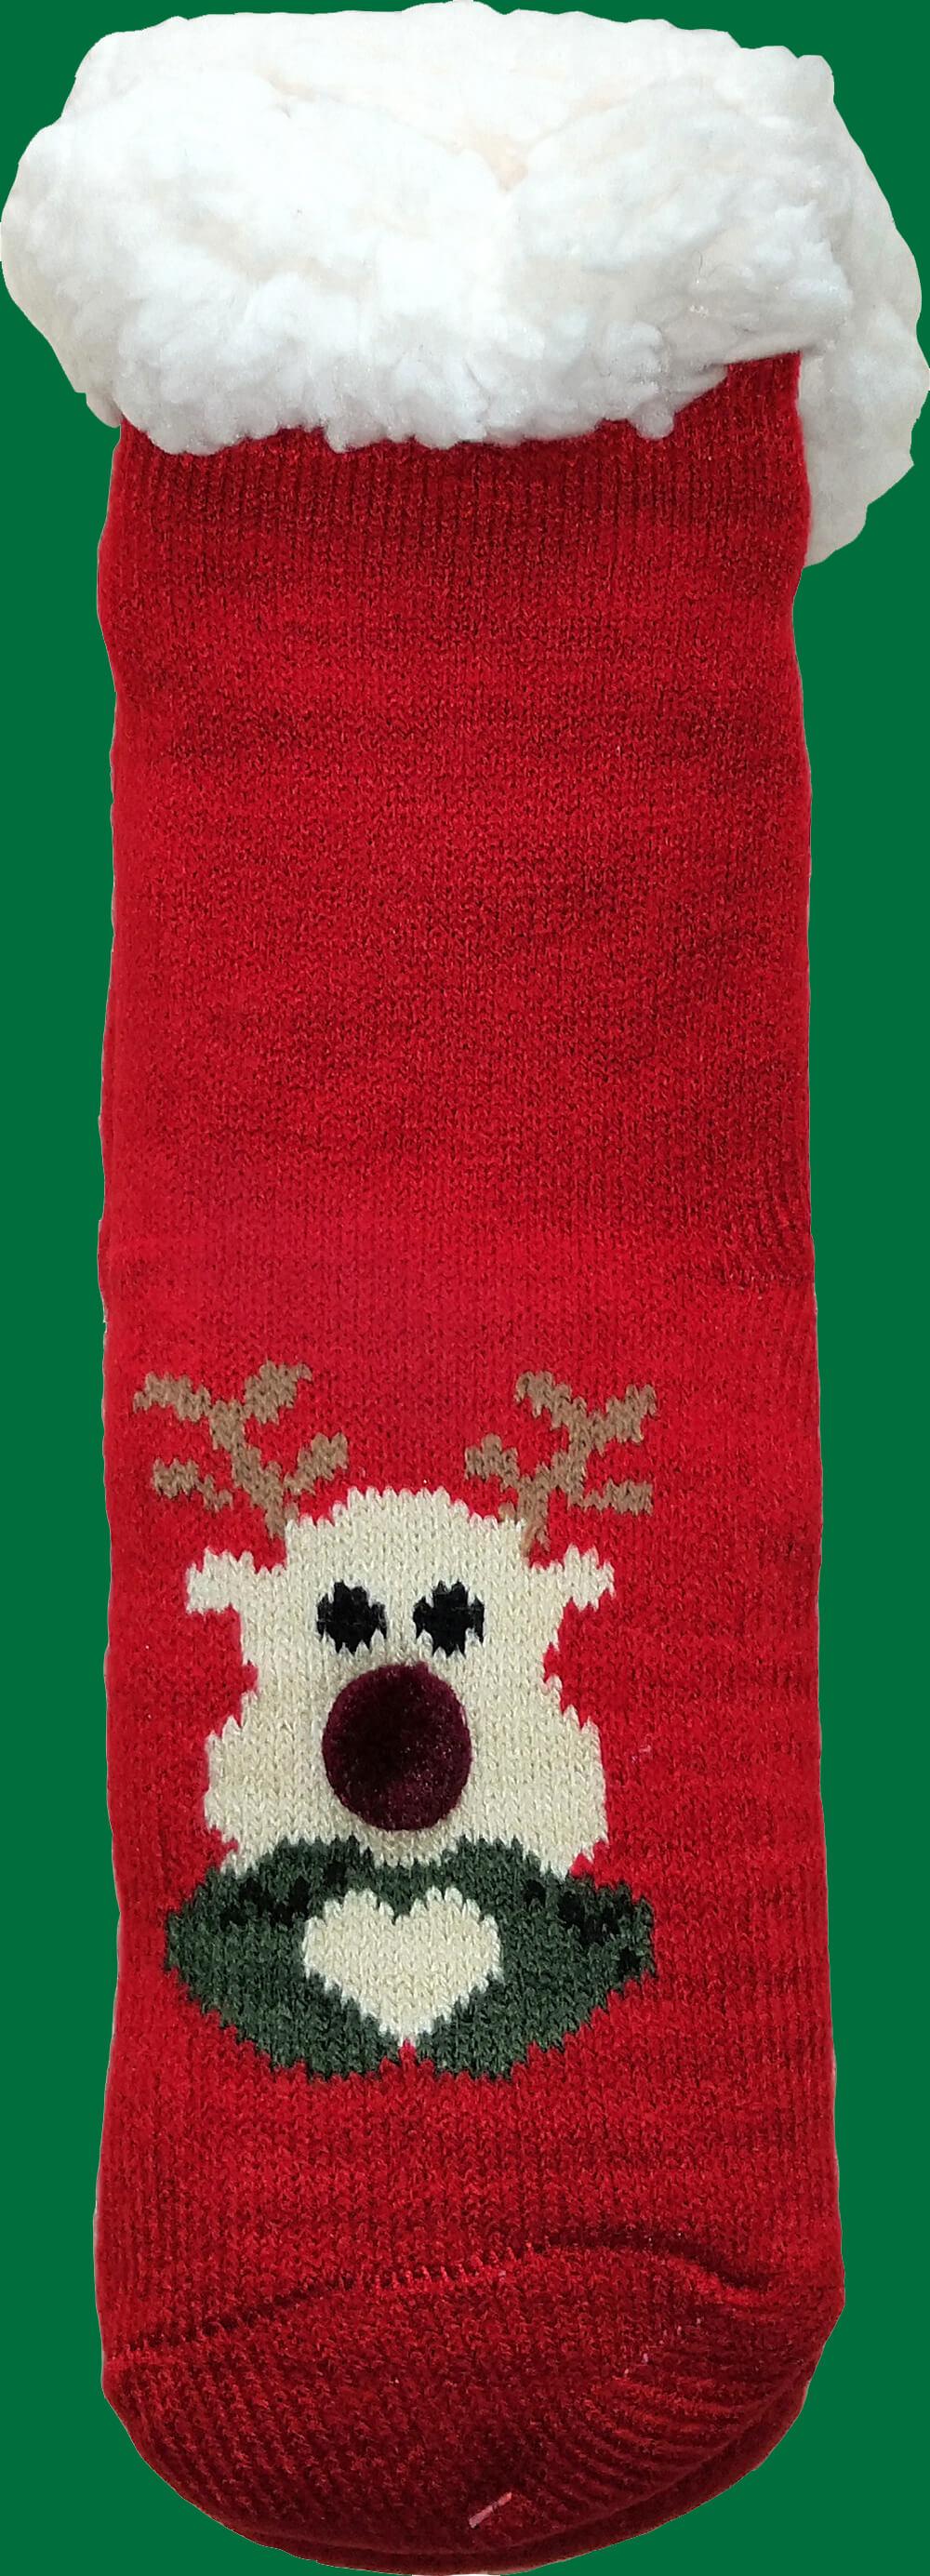 Детские носки-тапочки LookEN SM-HL-7211D-r 26-28 розміру красного цвета.